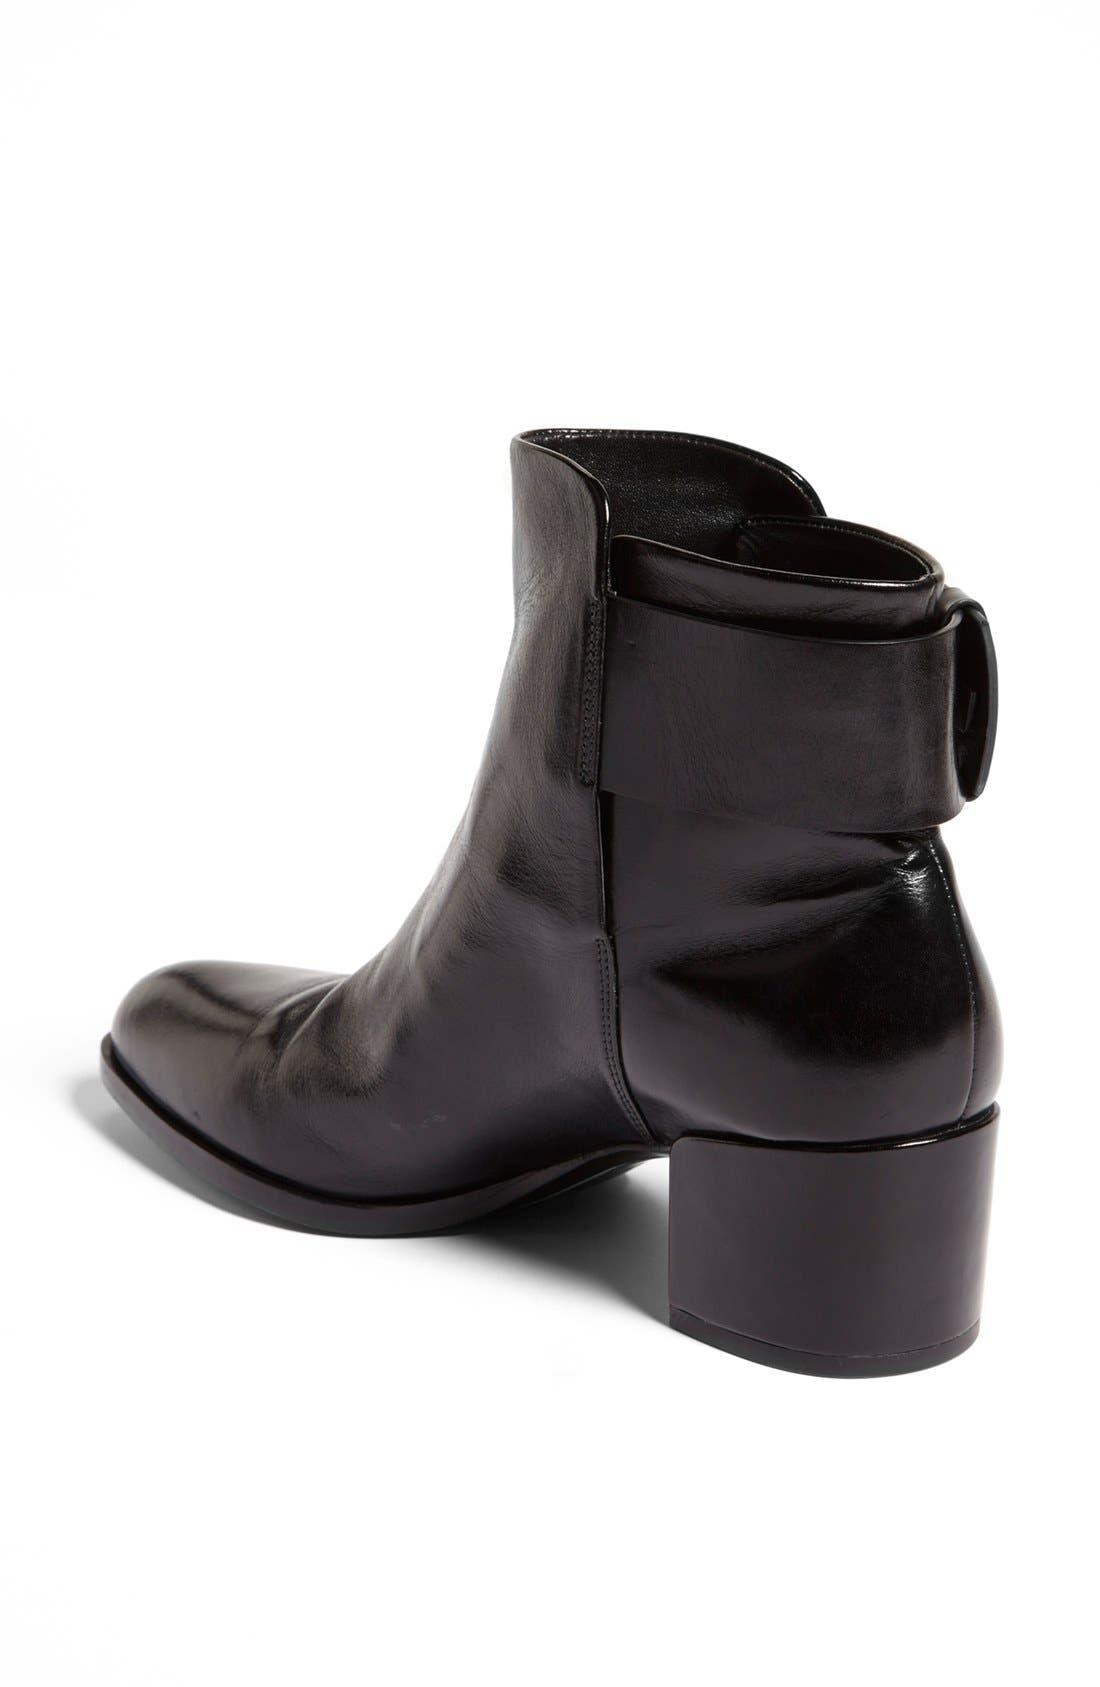 Alternate Image 2  - Alexander Wang 'Anja' Calfskin Leather Ankle Boot